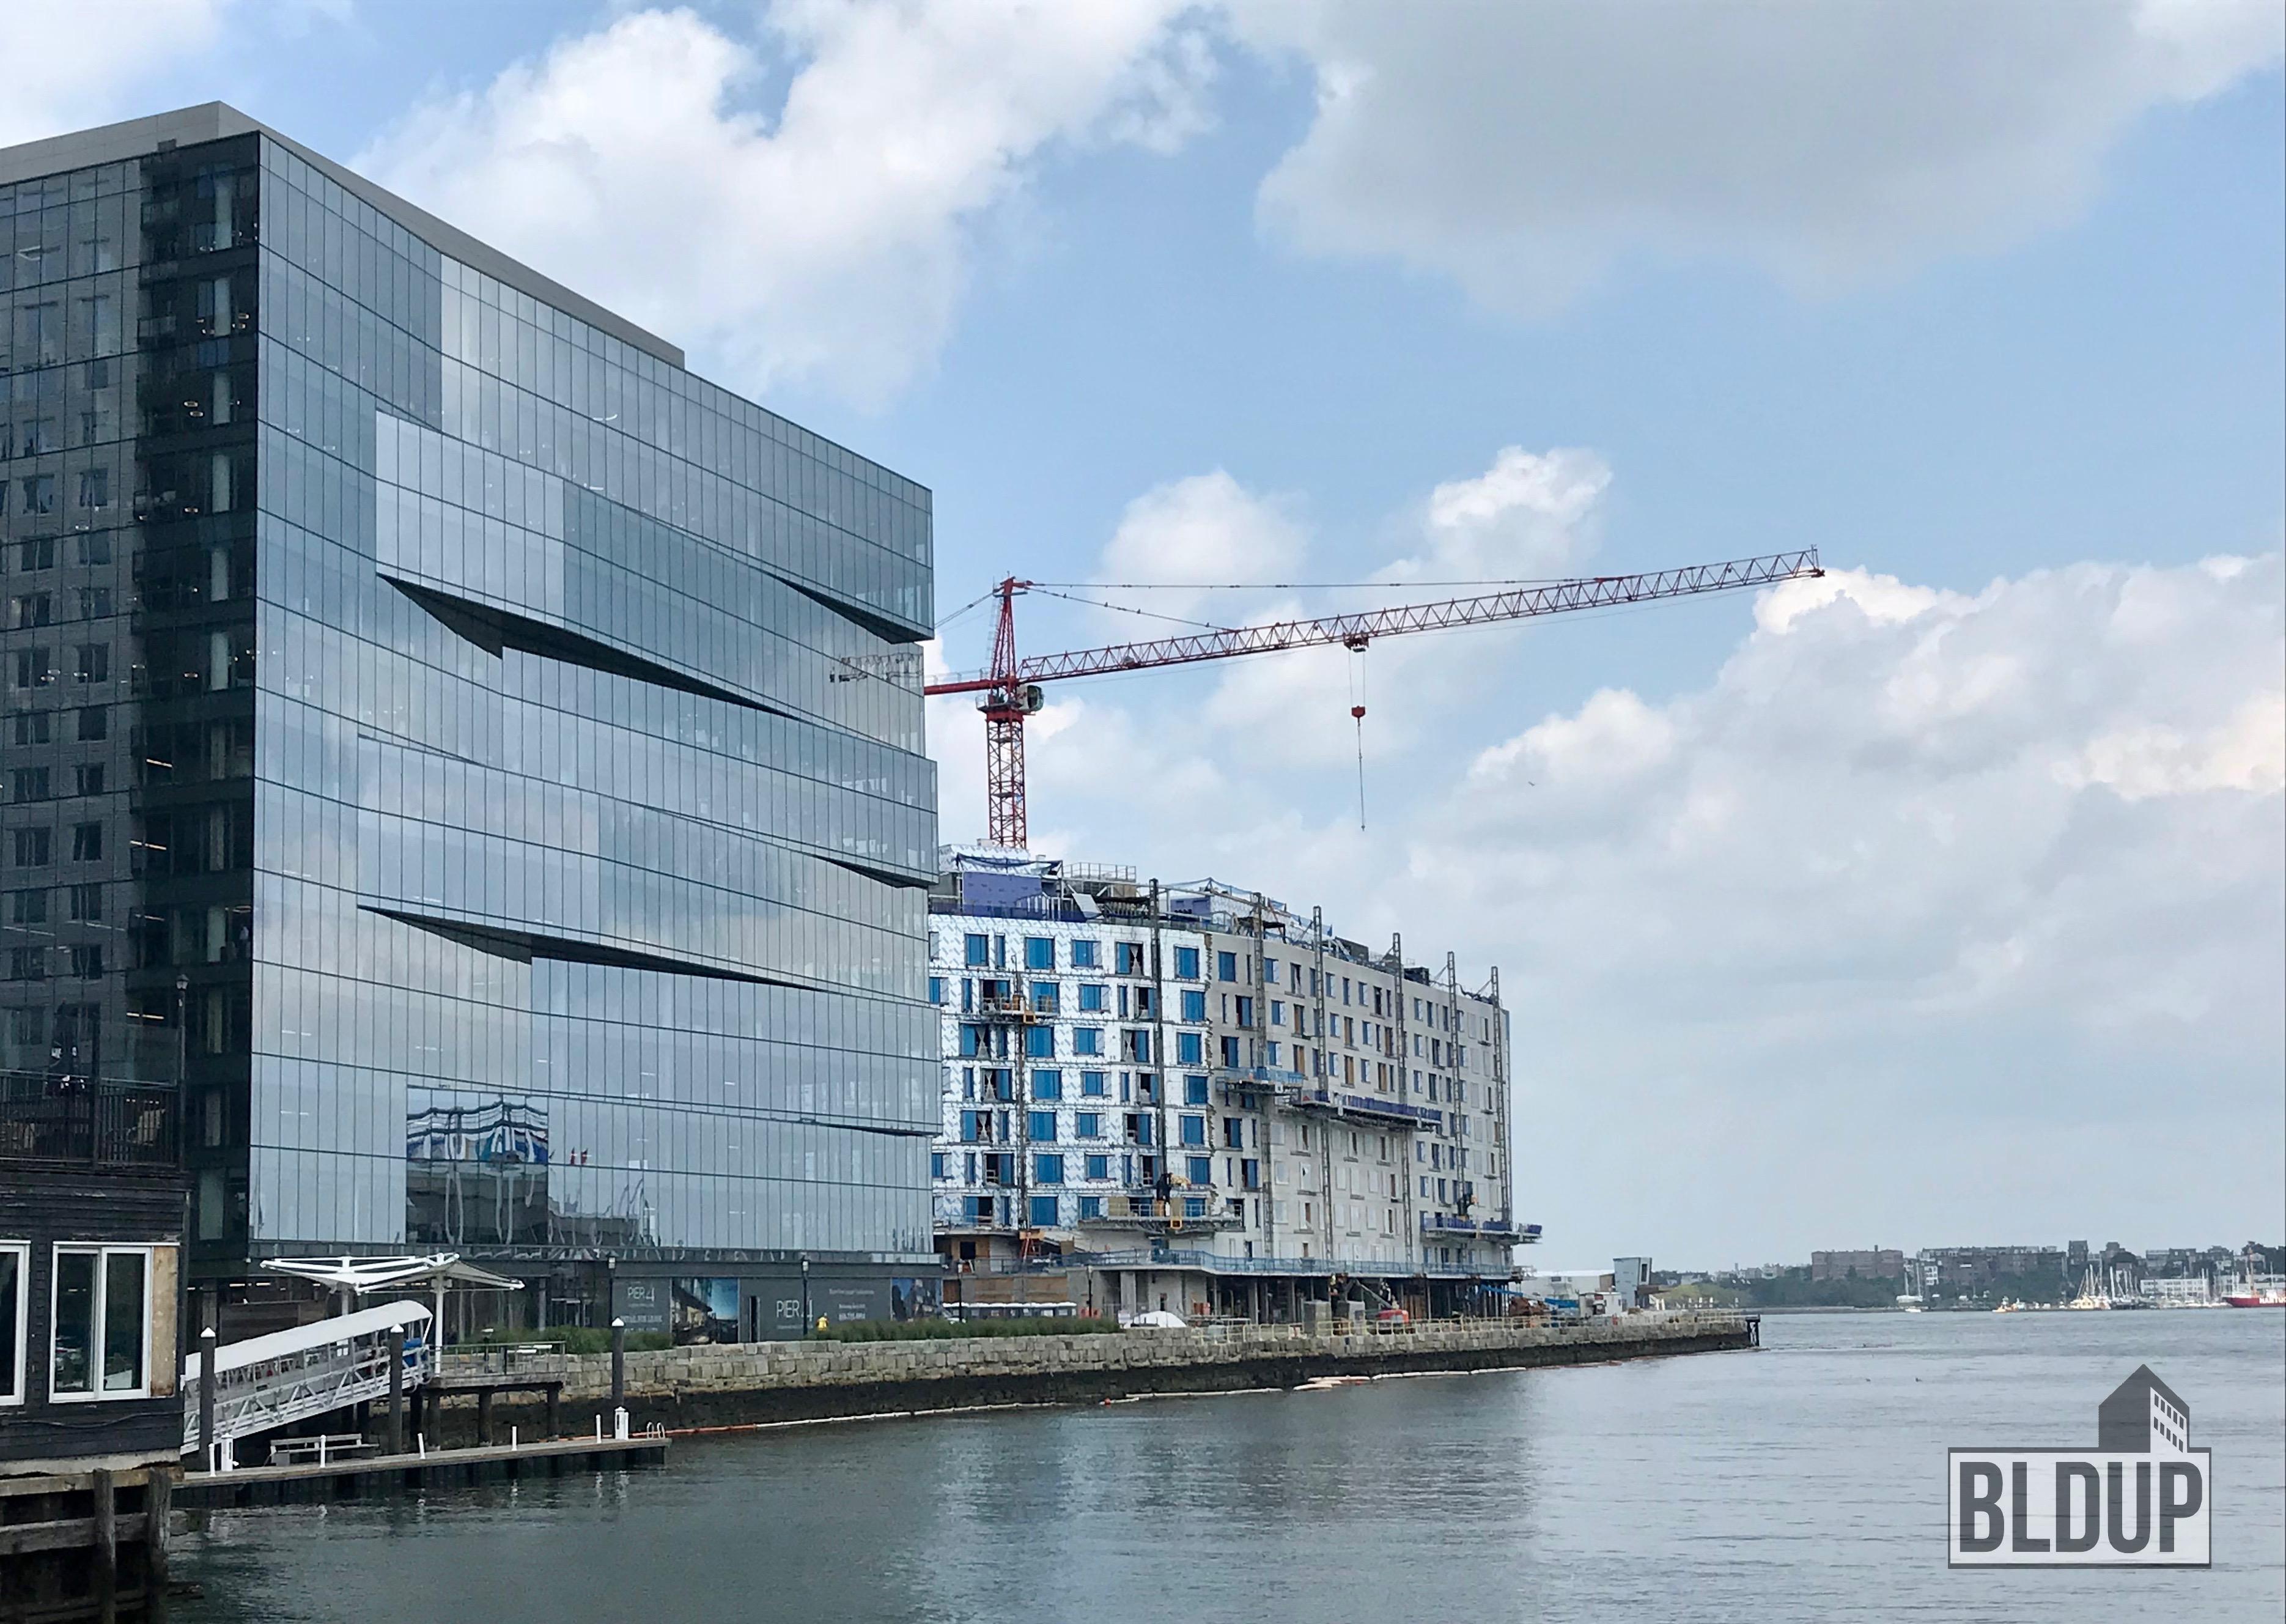 Bldup - Elkus Manfredi Architects